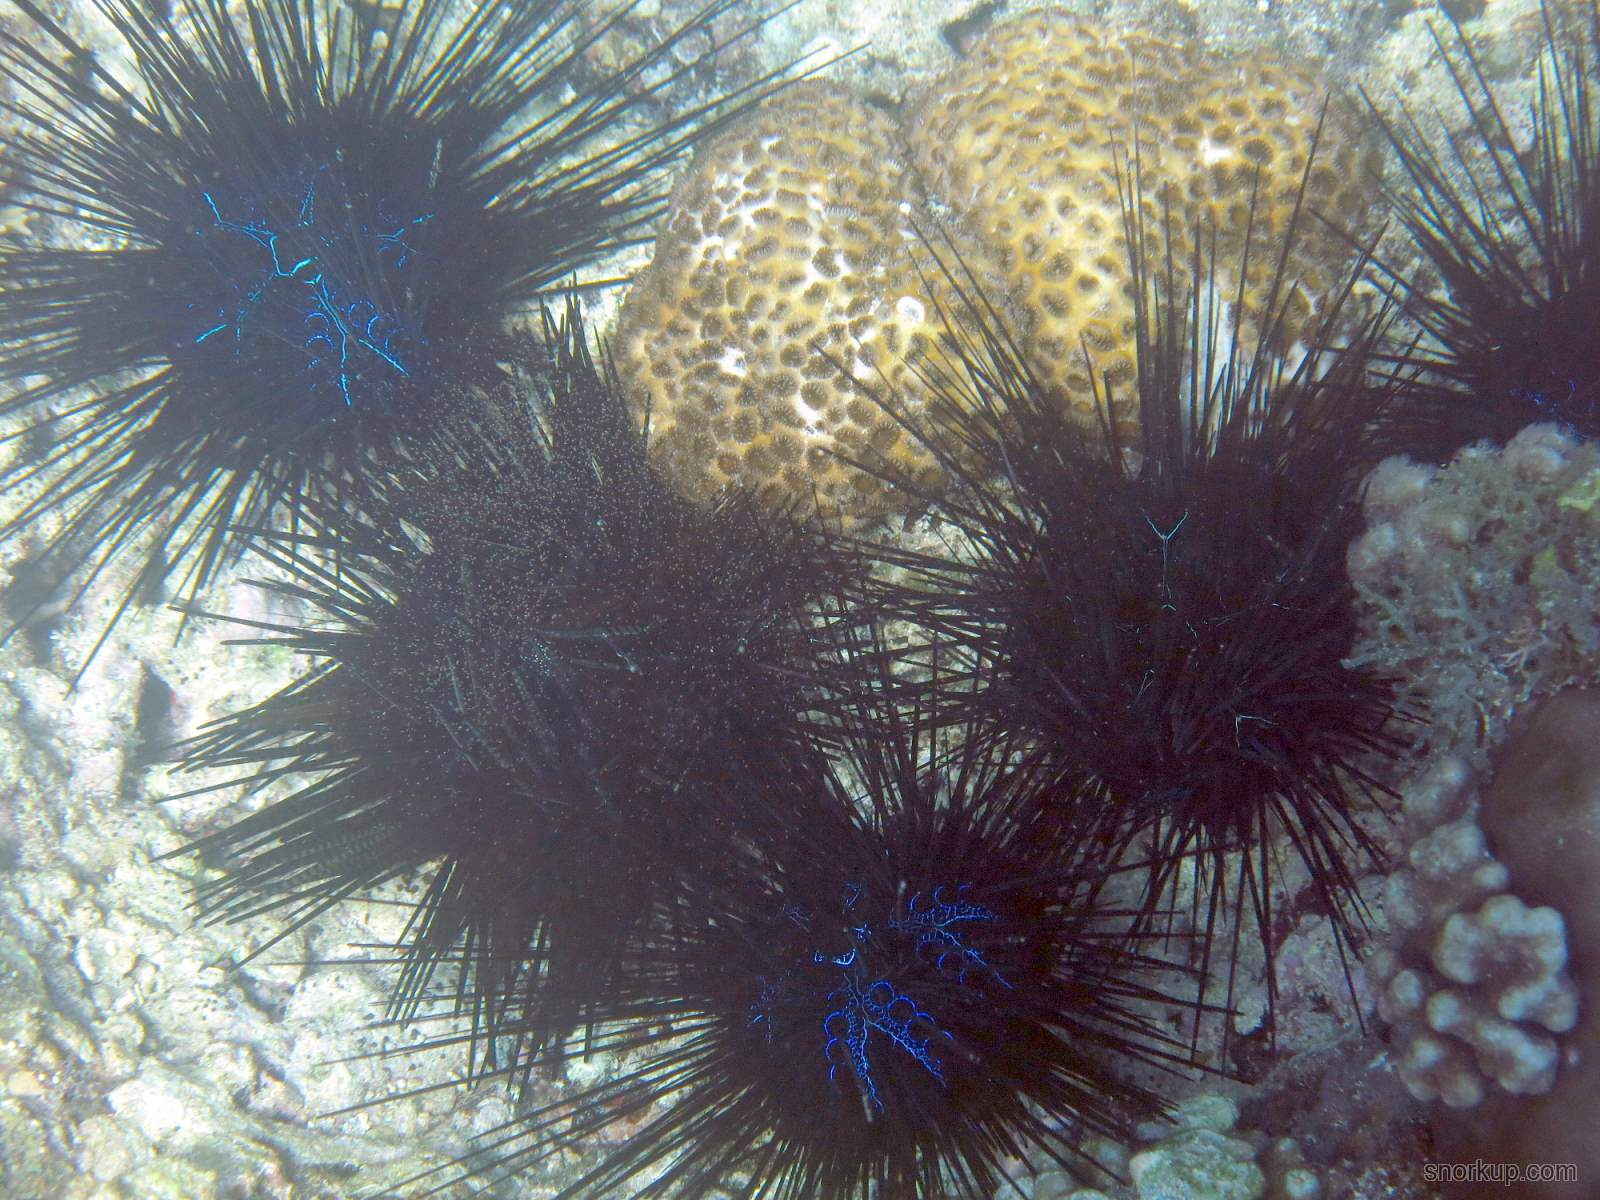 Длинноиглый еж-диадема, лат.Diadema savignyi, анг.Long spines sea urchin